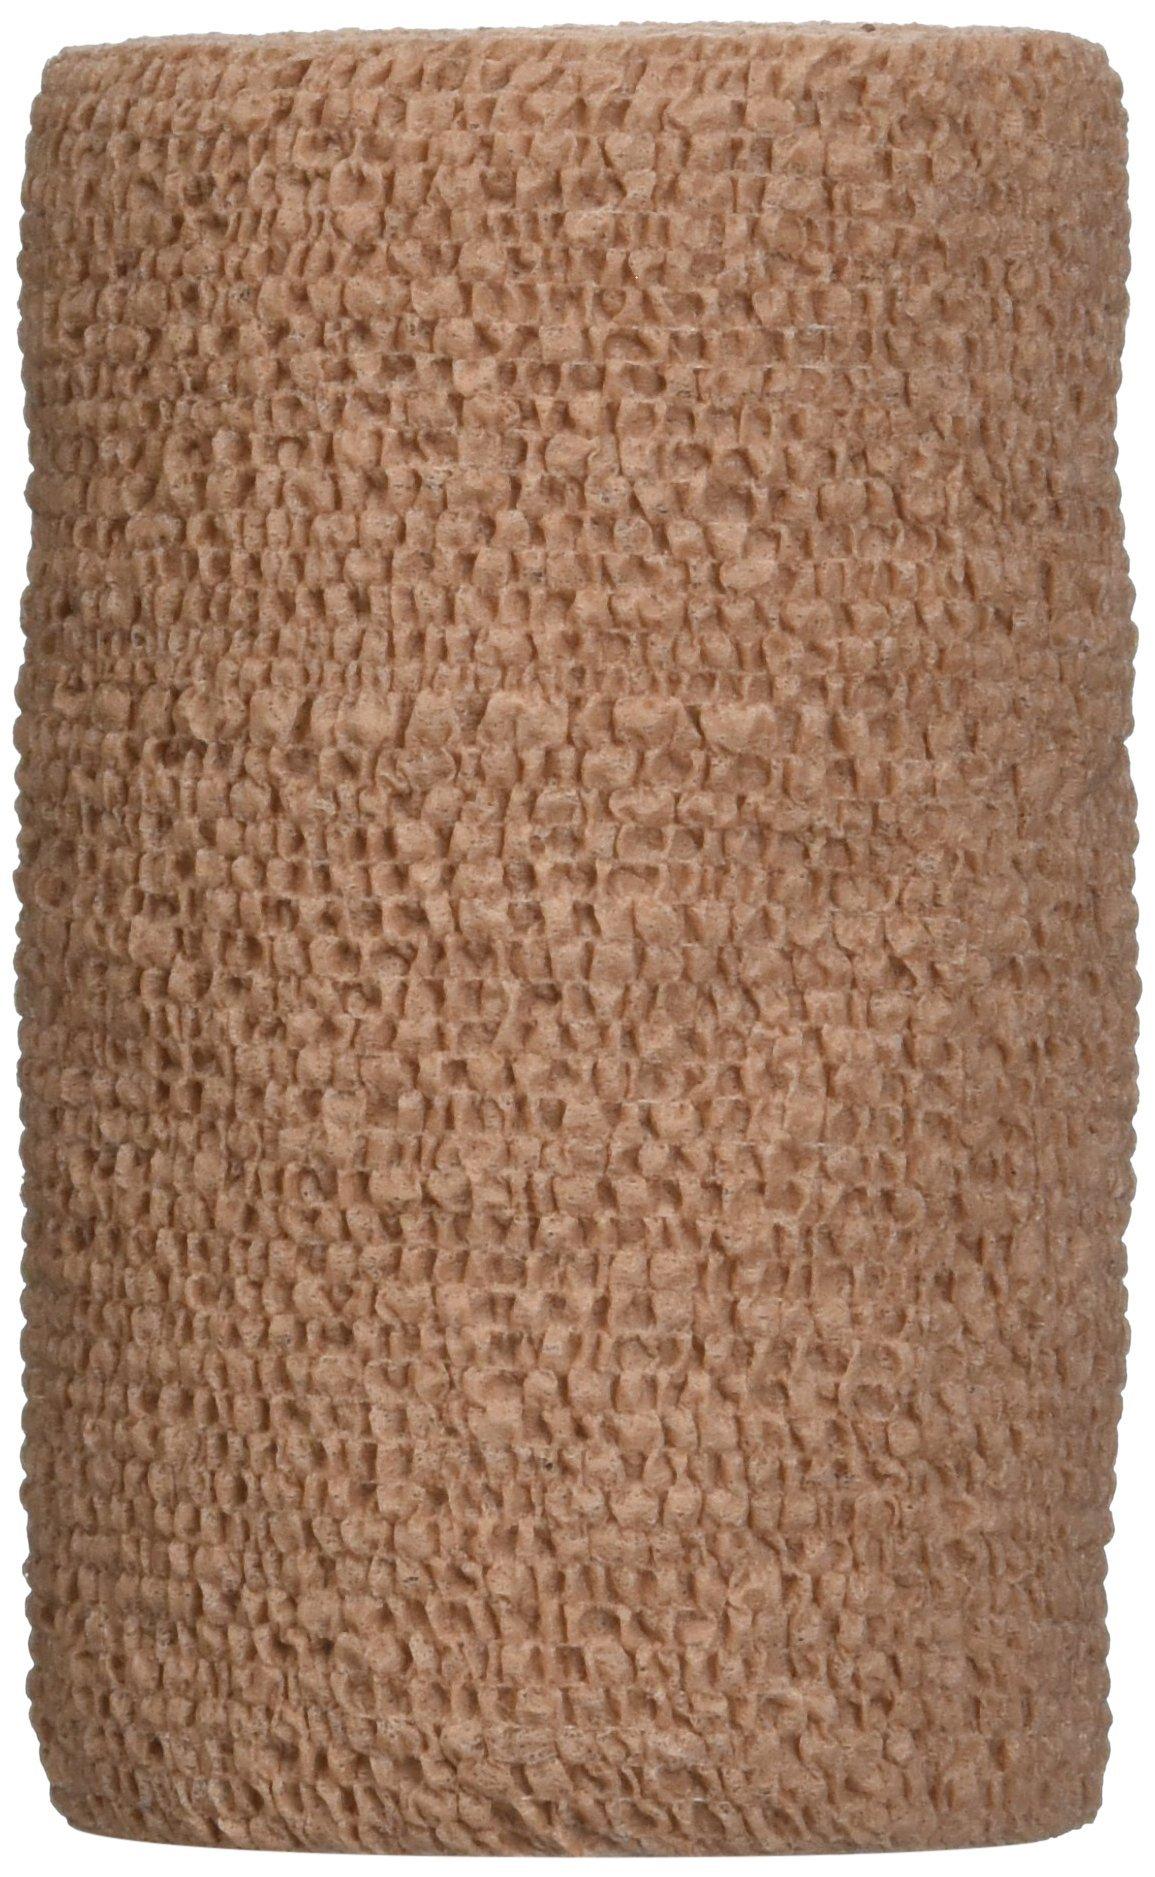 3M Health Care 1584 Coban Self-Adherent Wrap, Elastic, 5 yd. L x 4'' W, Tan (Pack of 18) by 3M Health Care